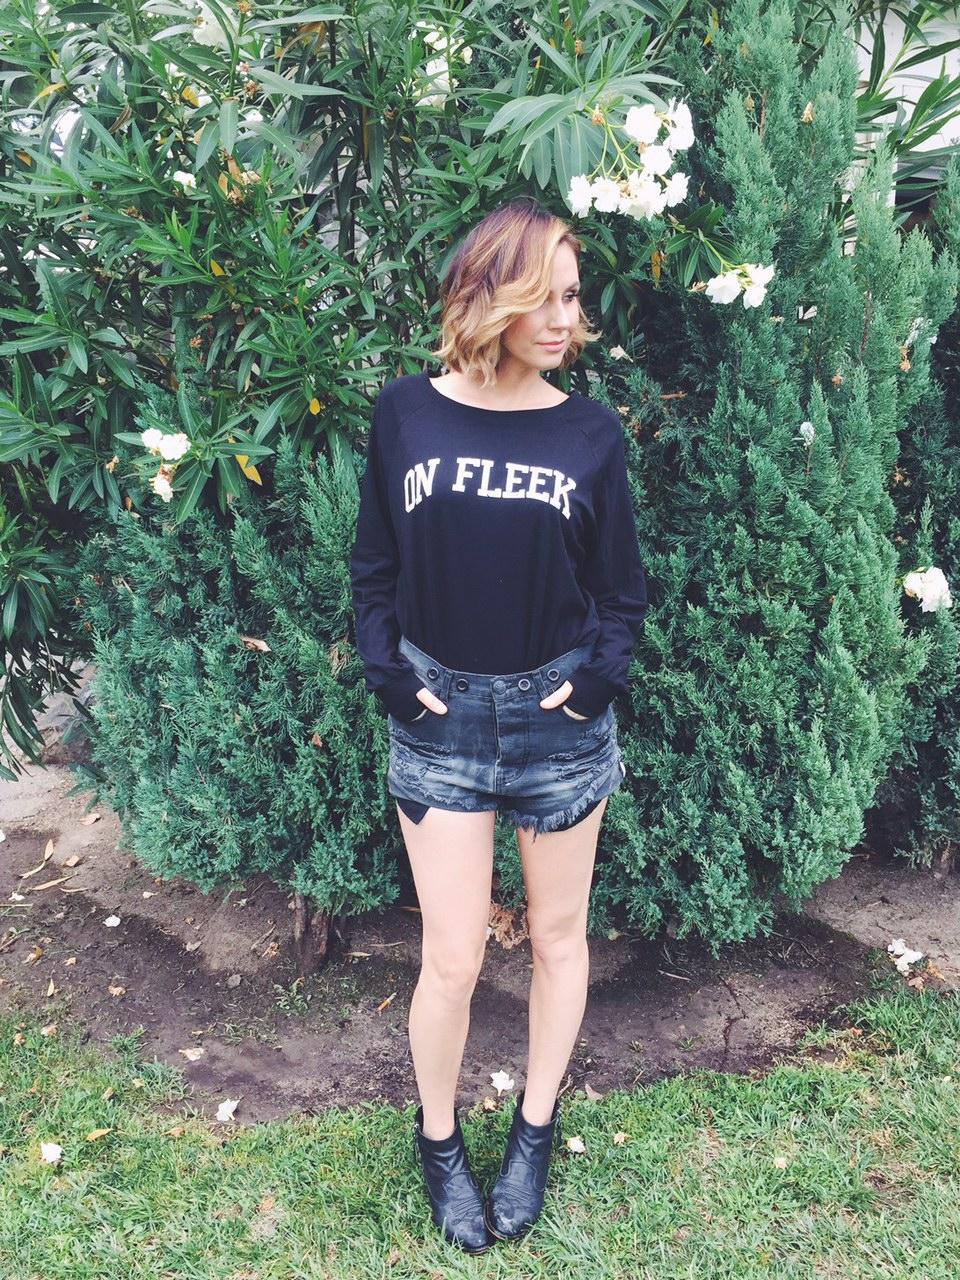 Keltie Colleen Sugar and Bruno On FLEEK sweater